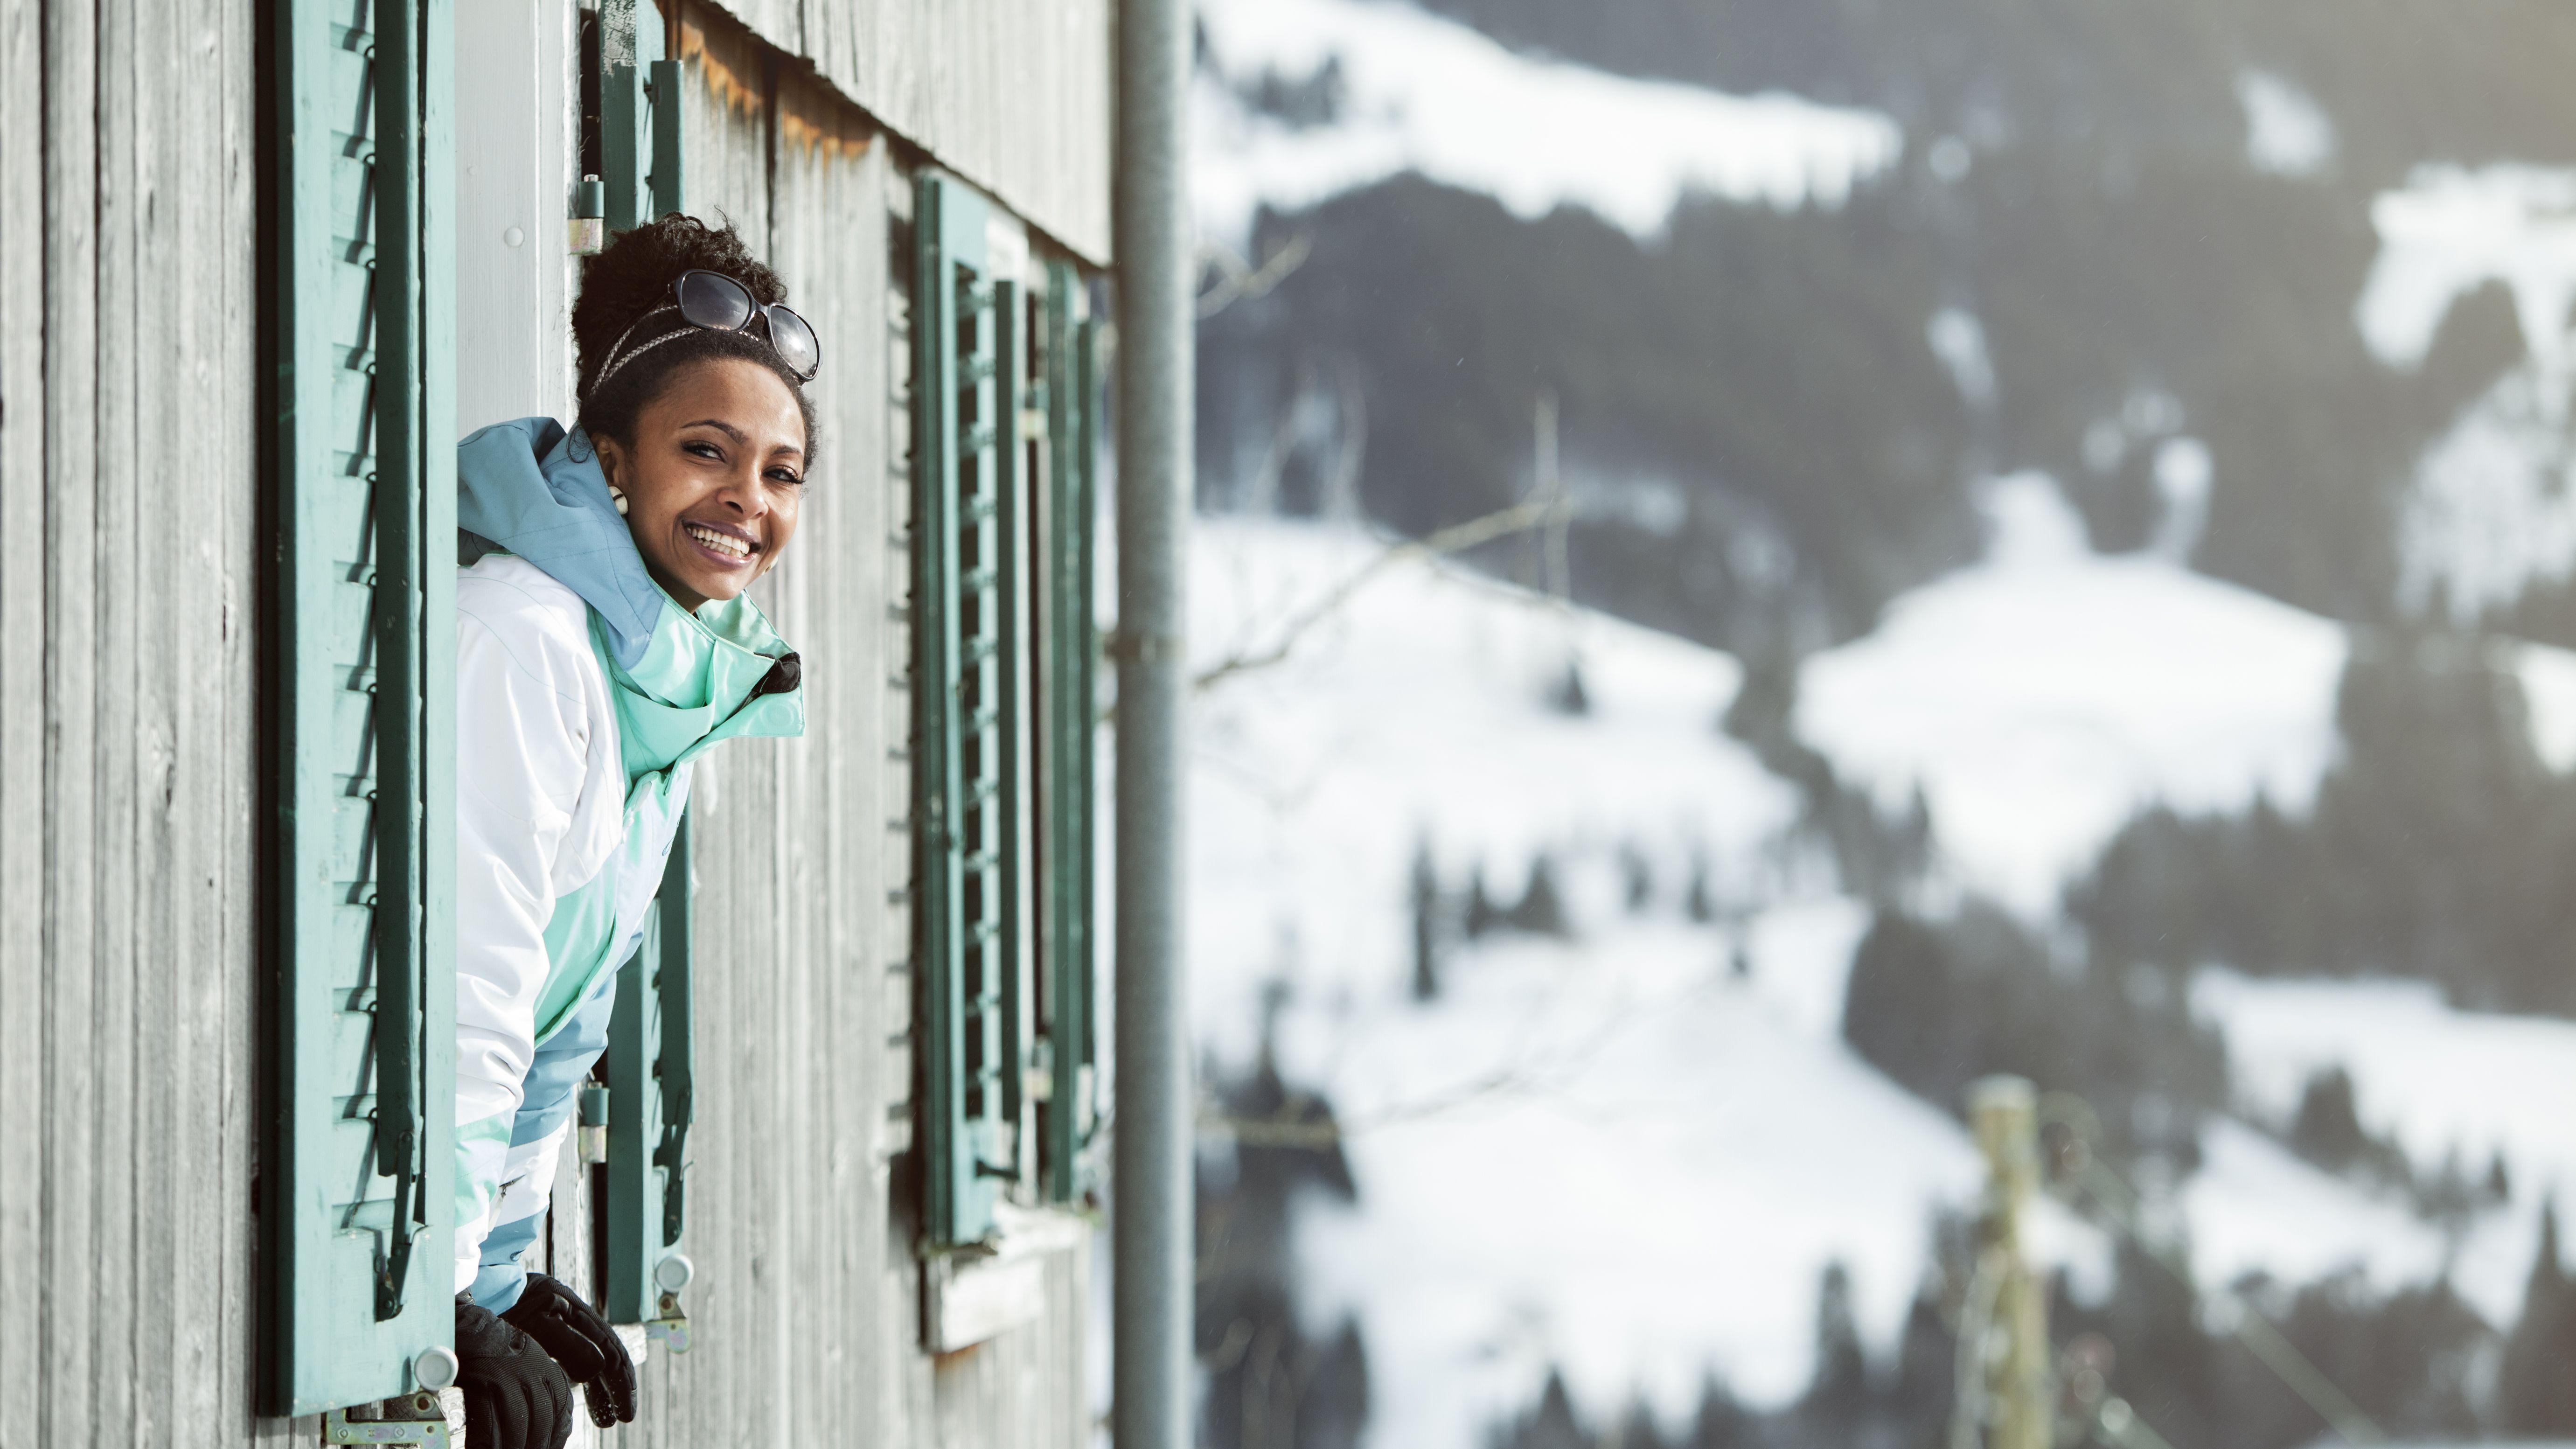 e10827e1cf2e The 6 Best Luxury Ski Wear Companies of 2019